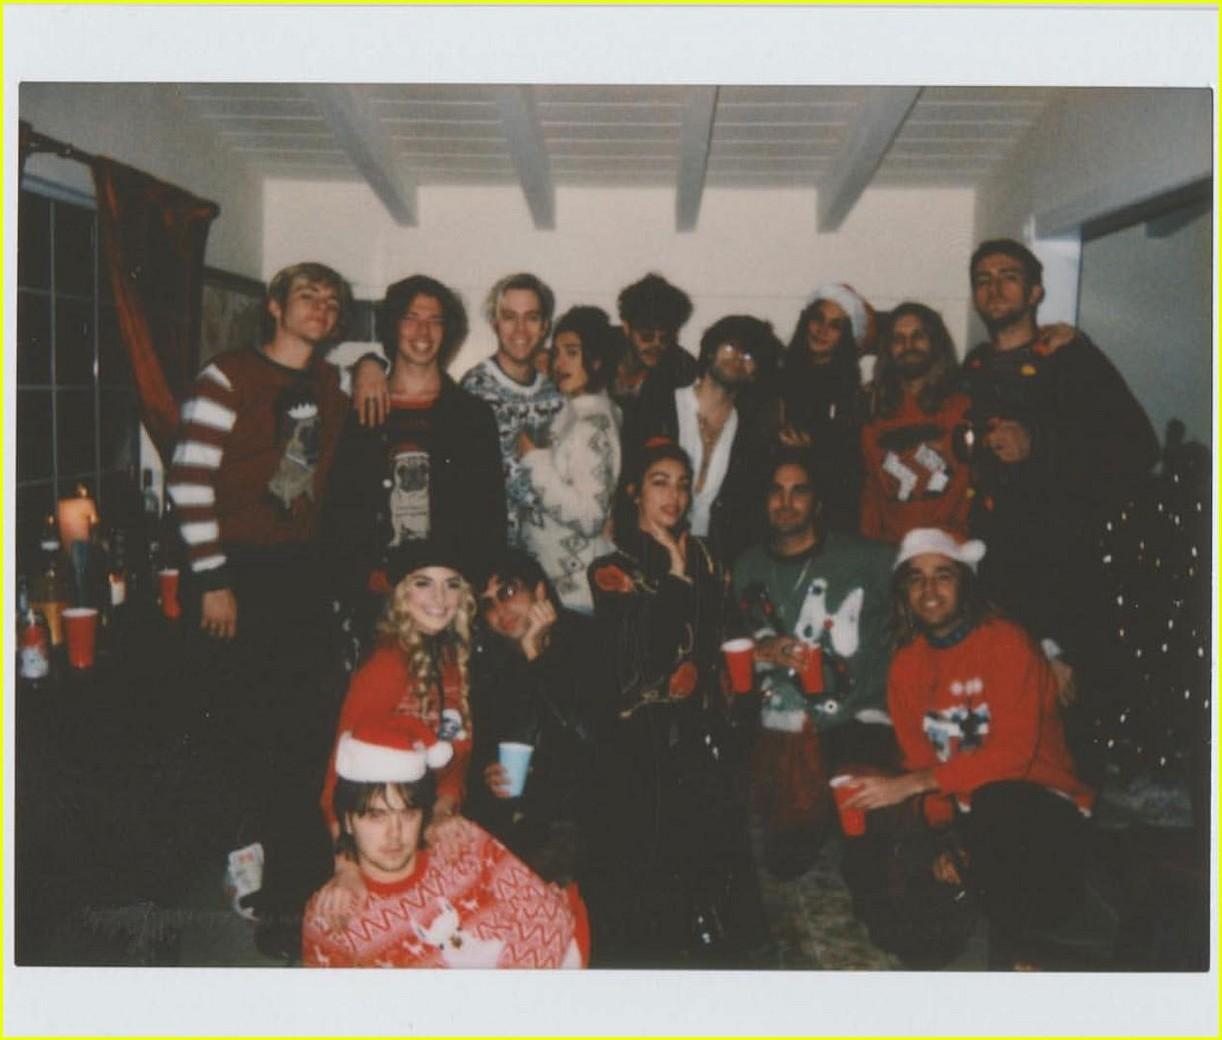 rydel lynch ellington ratliff cozy up christmas photo 05